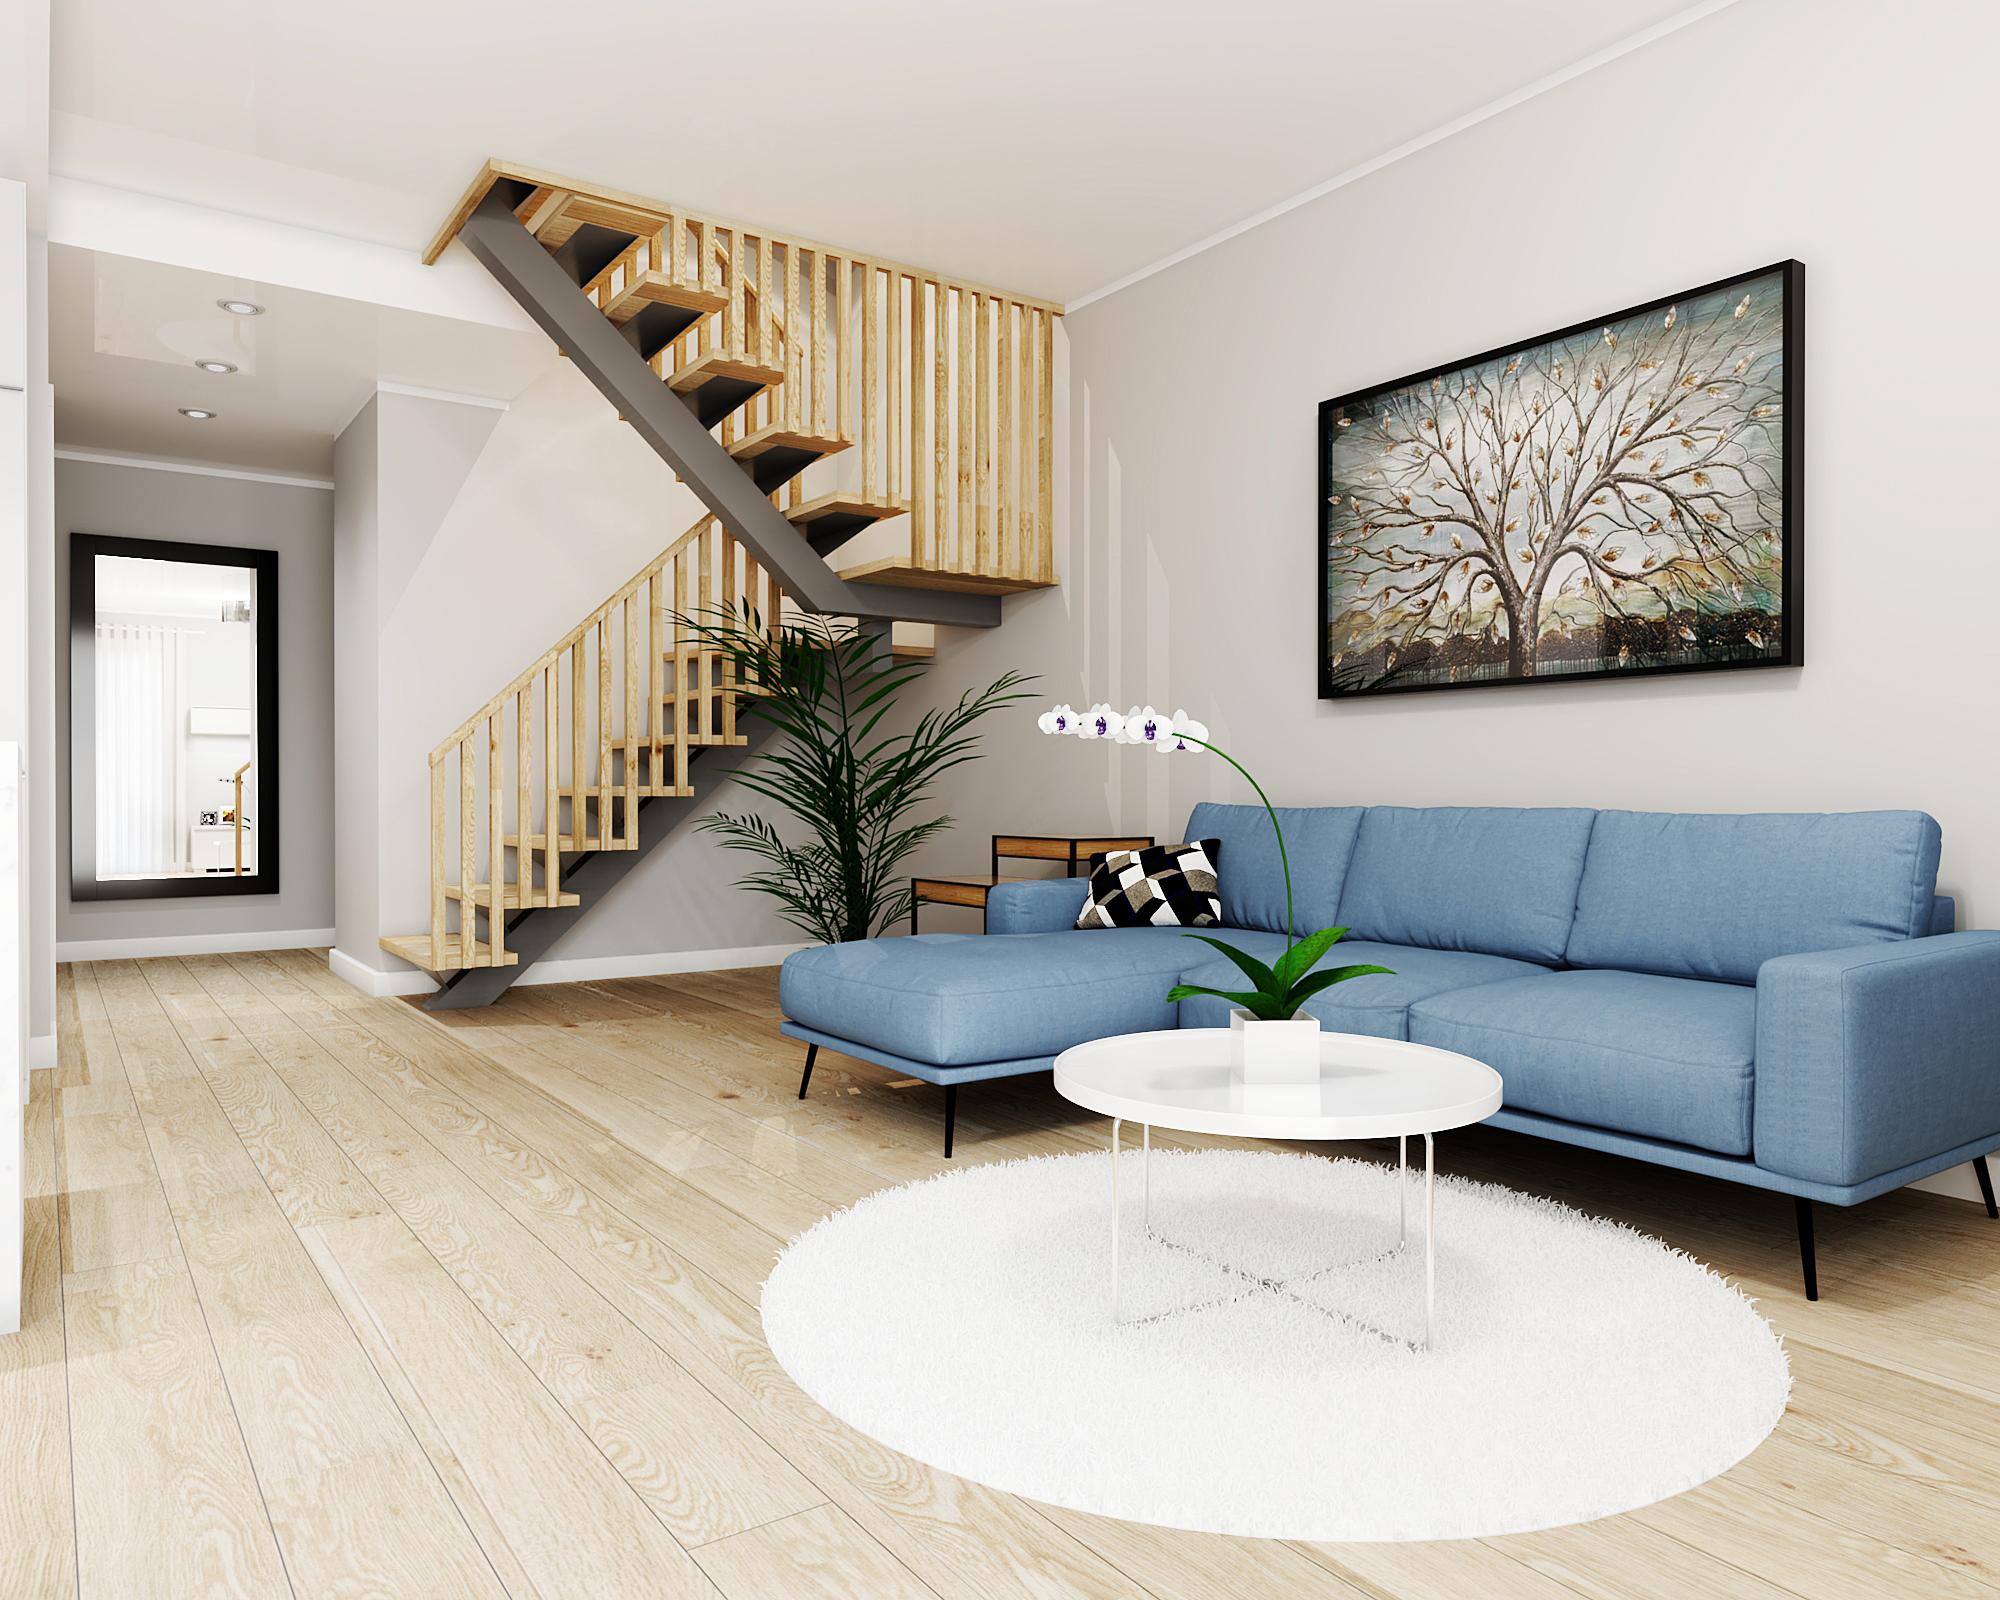 Terraced house living room